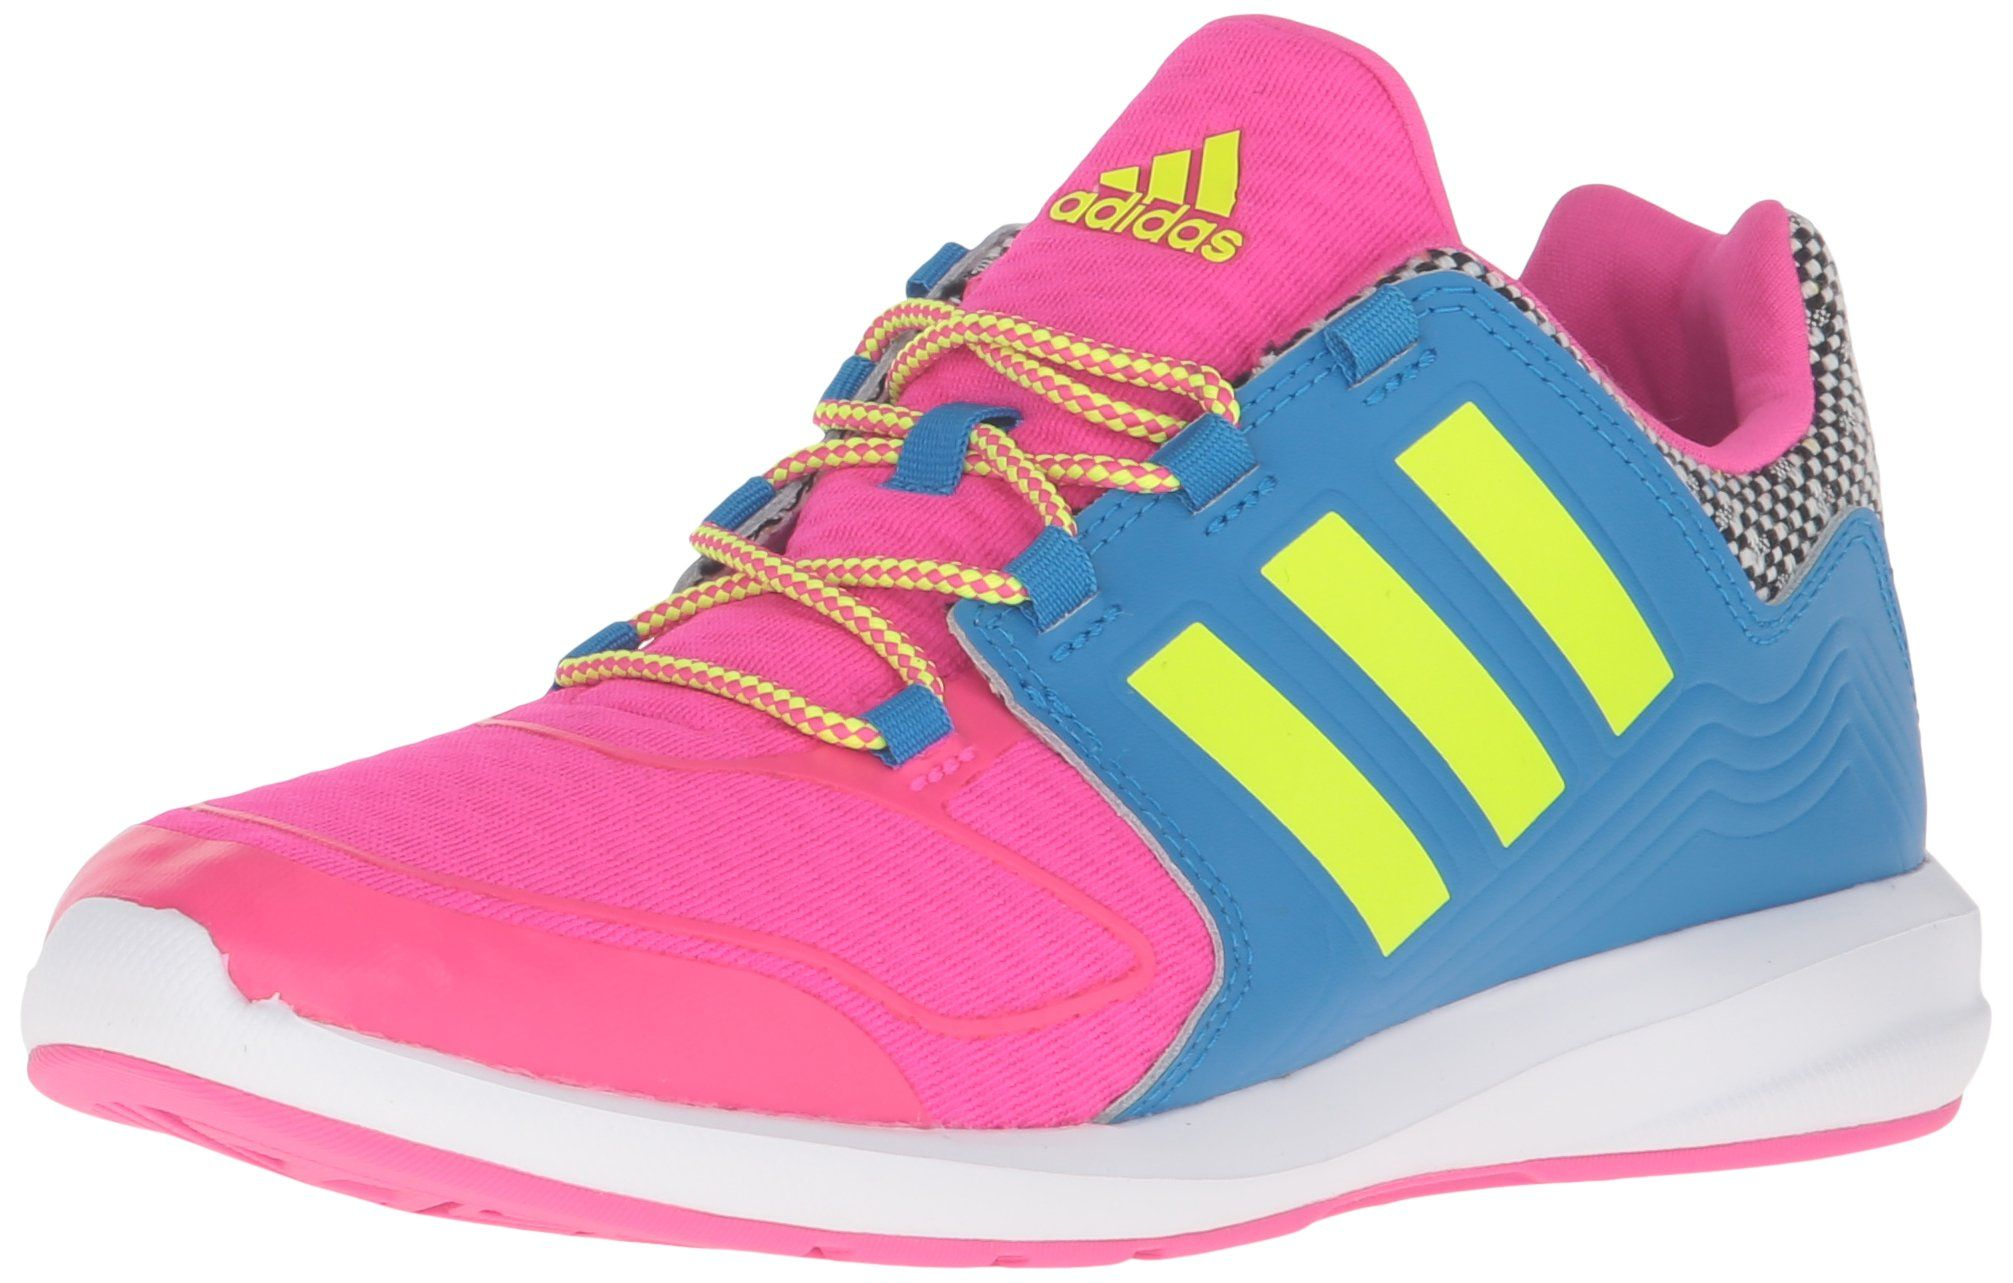 adidas Performance s-Flex K Running Shoe Shock Pink/Electricity/Shock Blue New